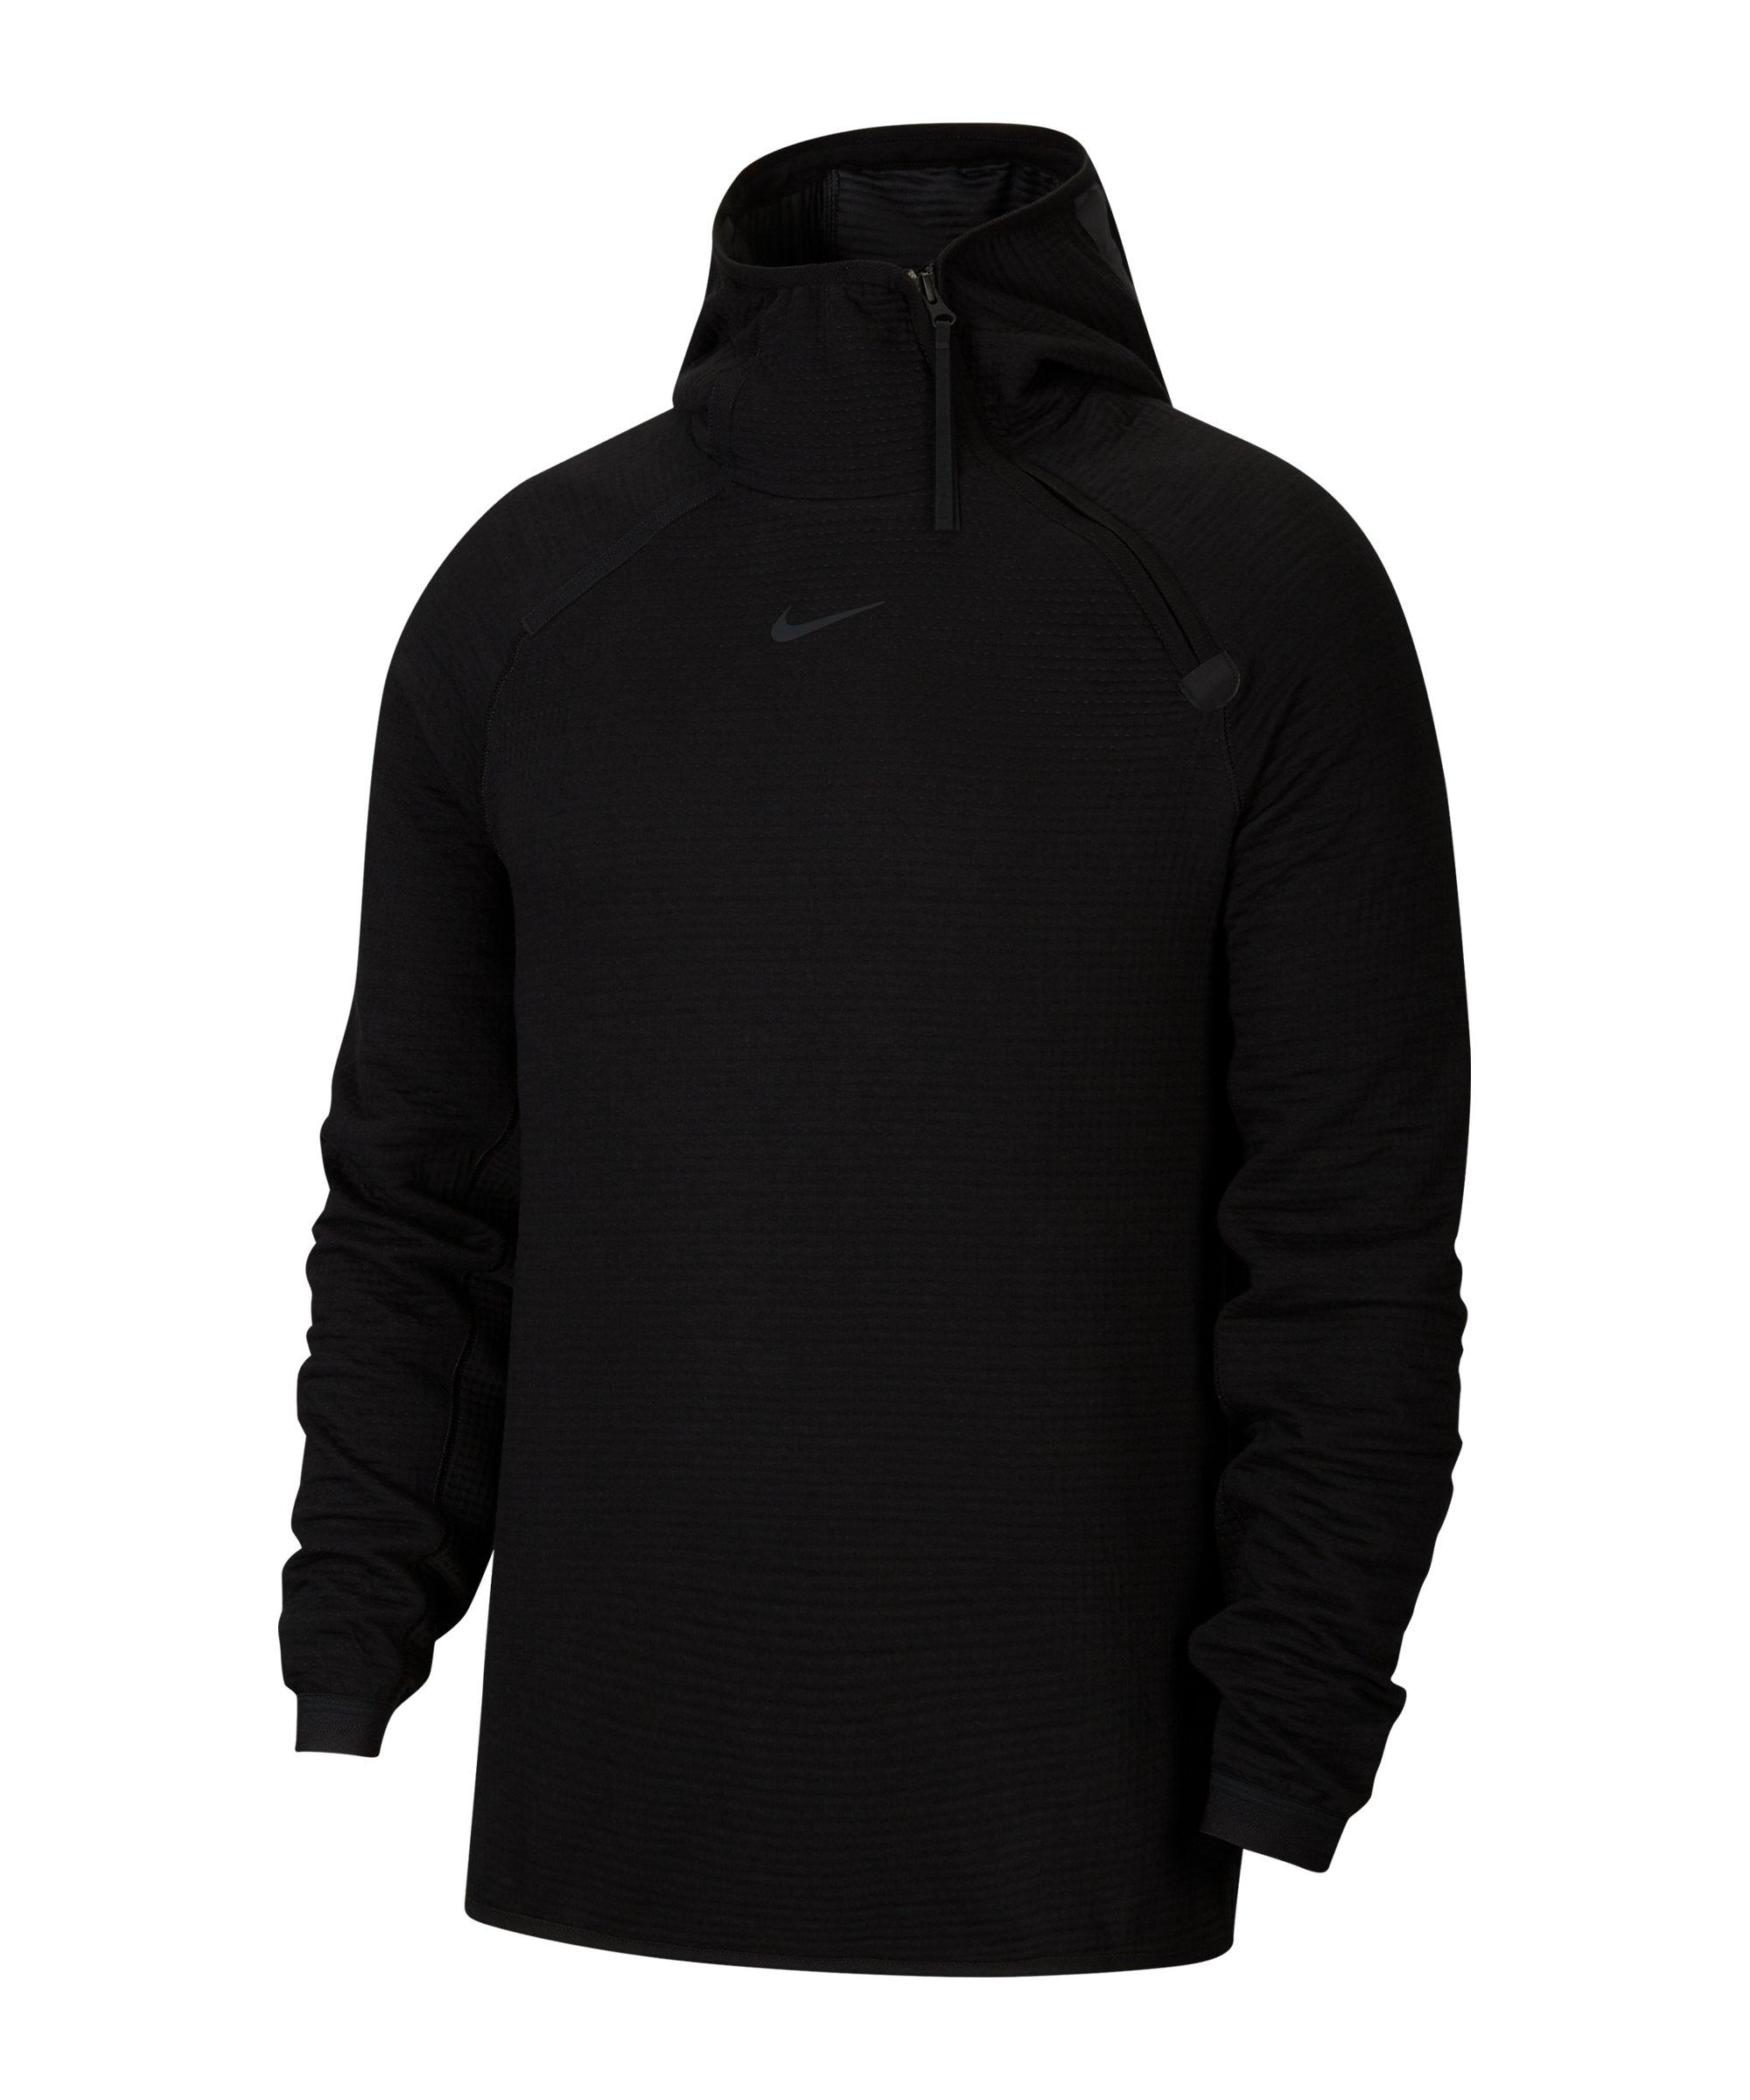 Nike Tech Pack Hoody Schwarz F010 - schwarz